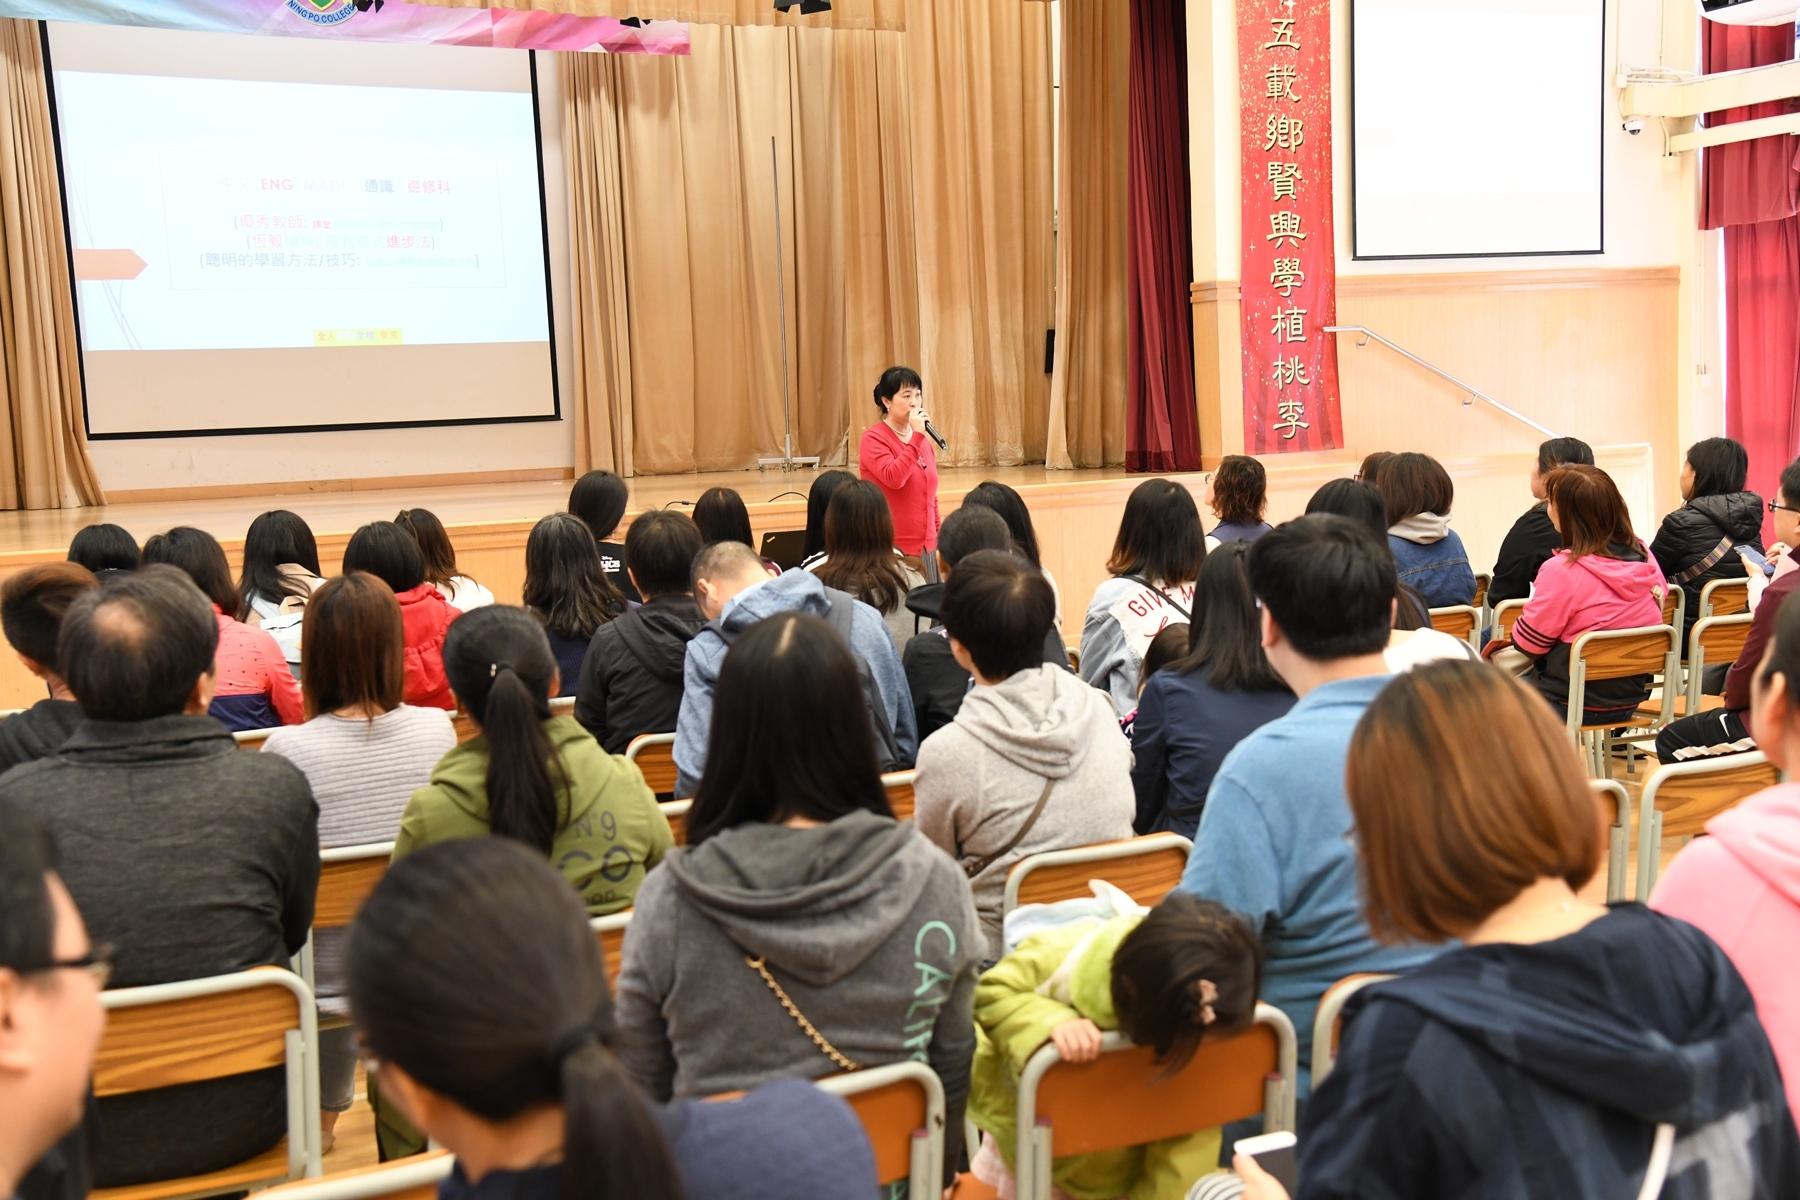 http://npc.edu.hk/sites/default/files/dsc_0181_4.jpg